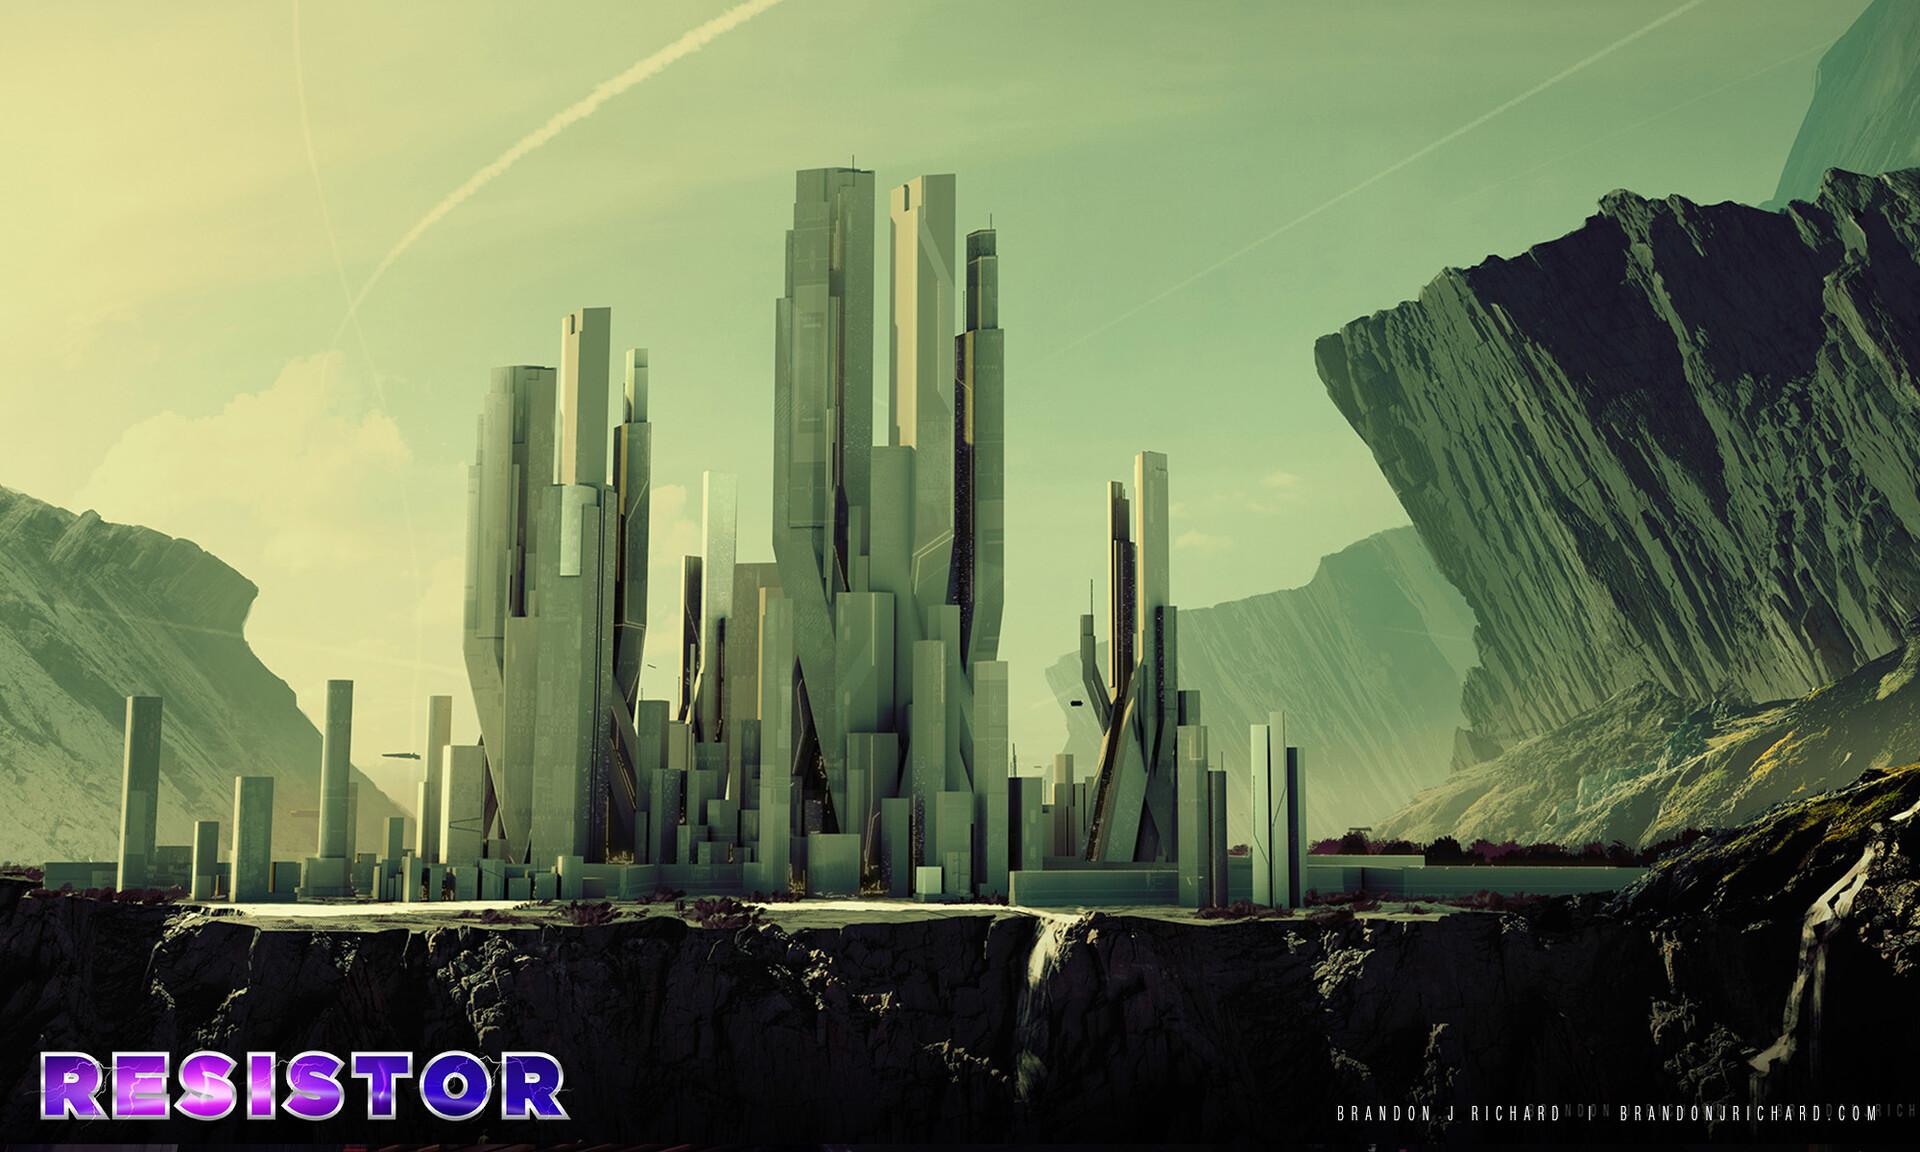 Brandon j richard resistor hq city2 brandon j richard